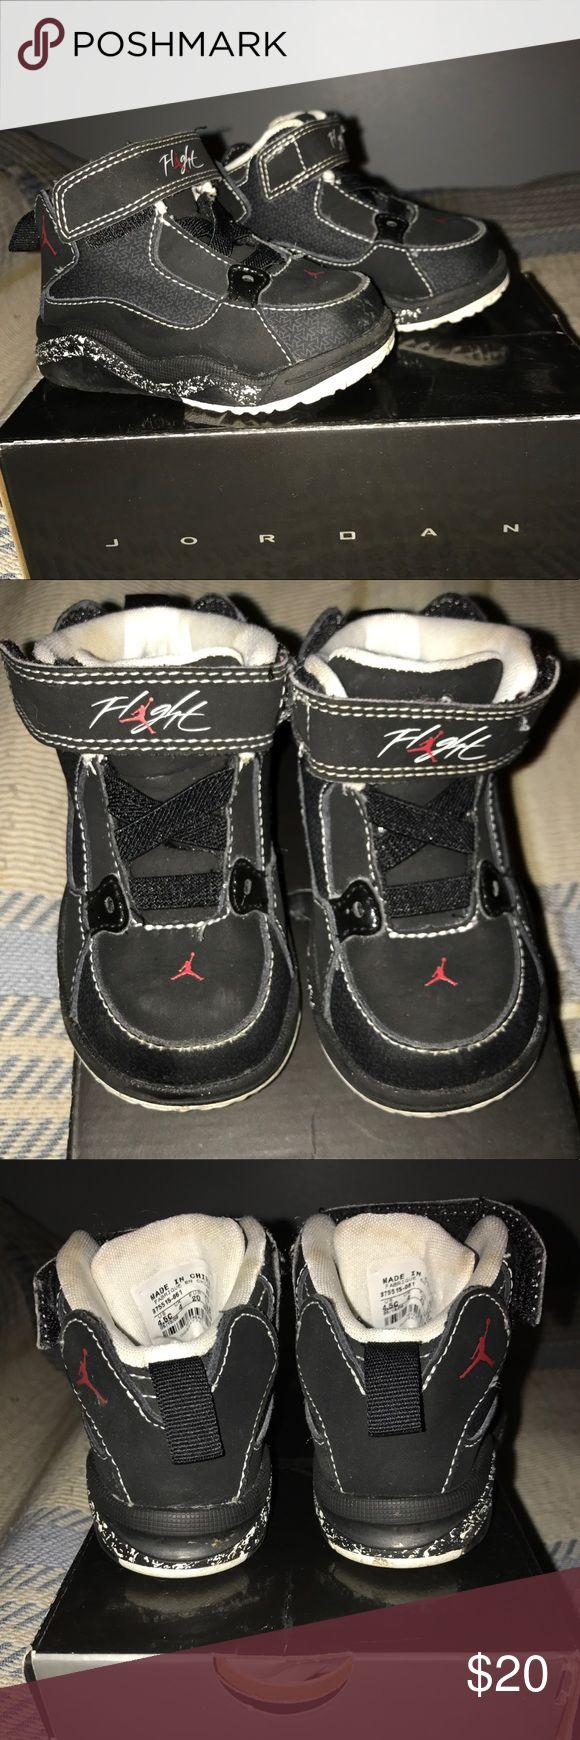 Toddler Jordan Ol'school 3,  size 4.5 Black, white, and red Jordan ol' school III toddler sized 4.5 Jordan Shoes Sneakers